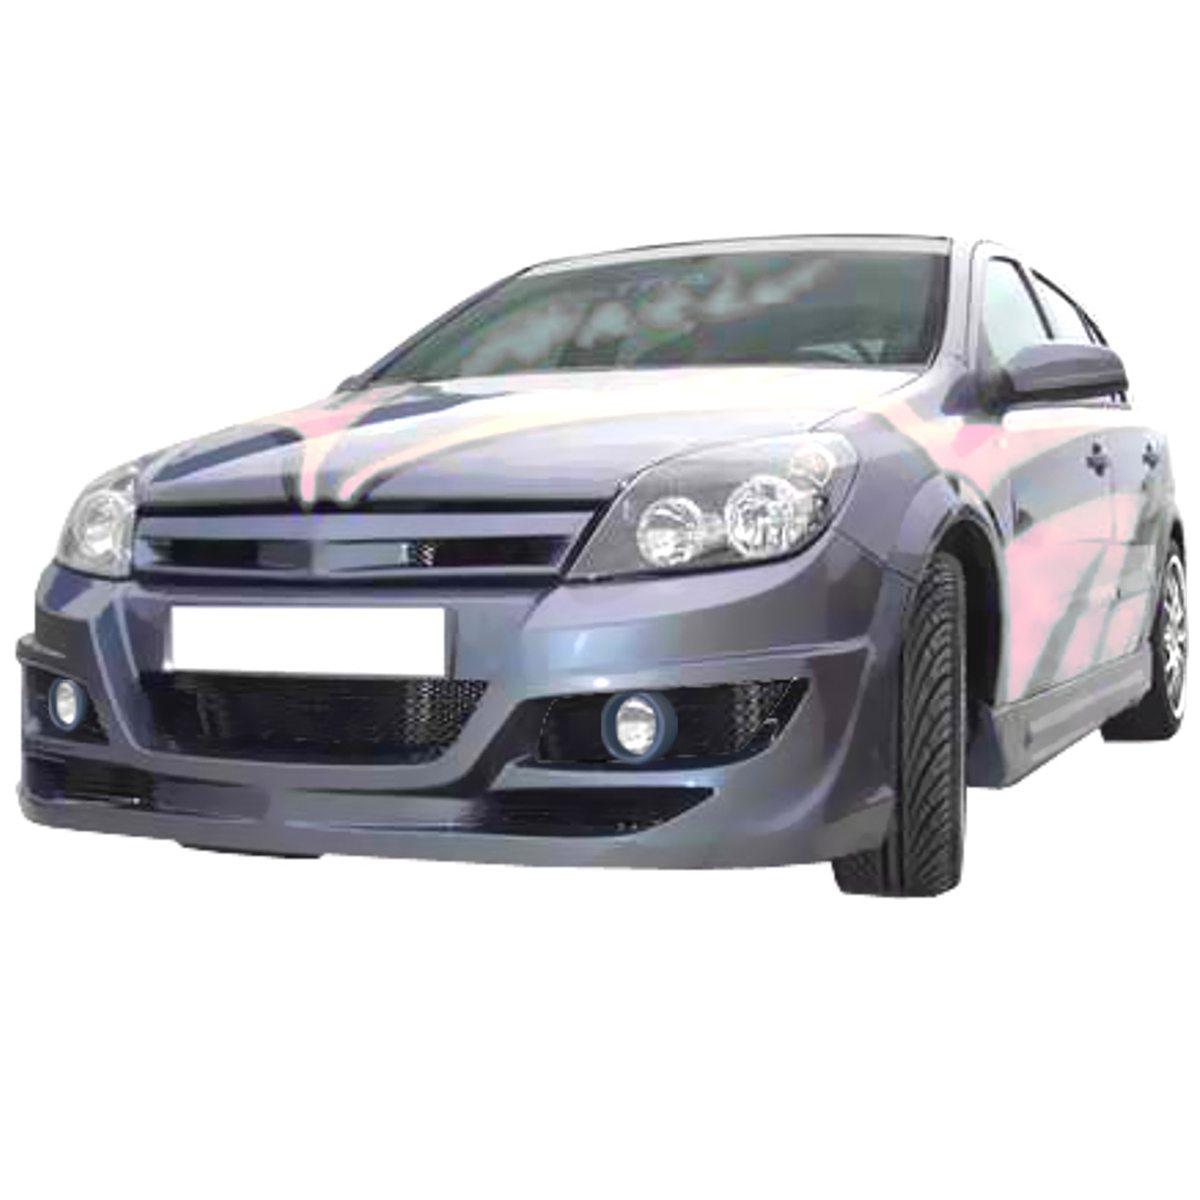 Opel-Astra-H-Punisher-C-F-Frt-PCU0450.1